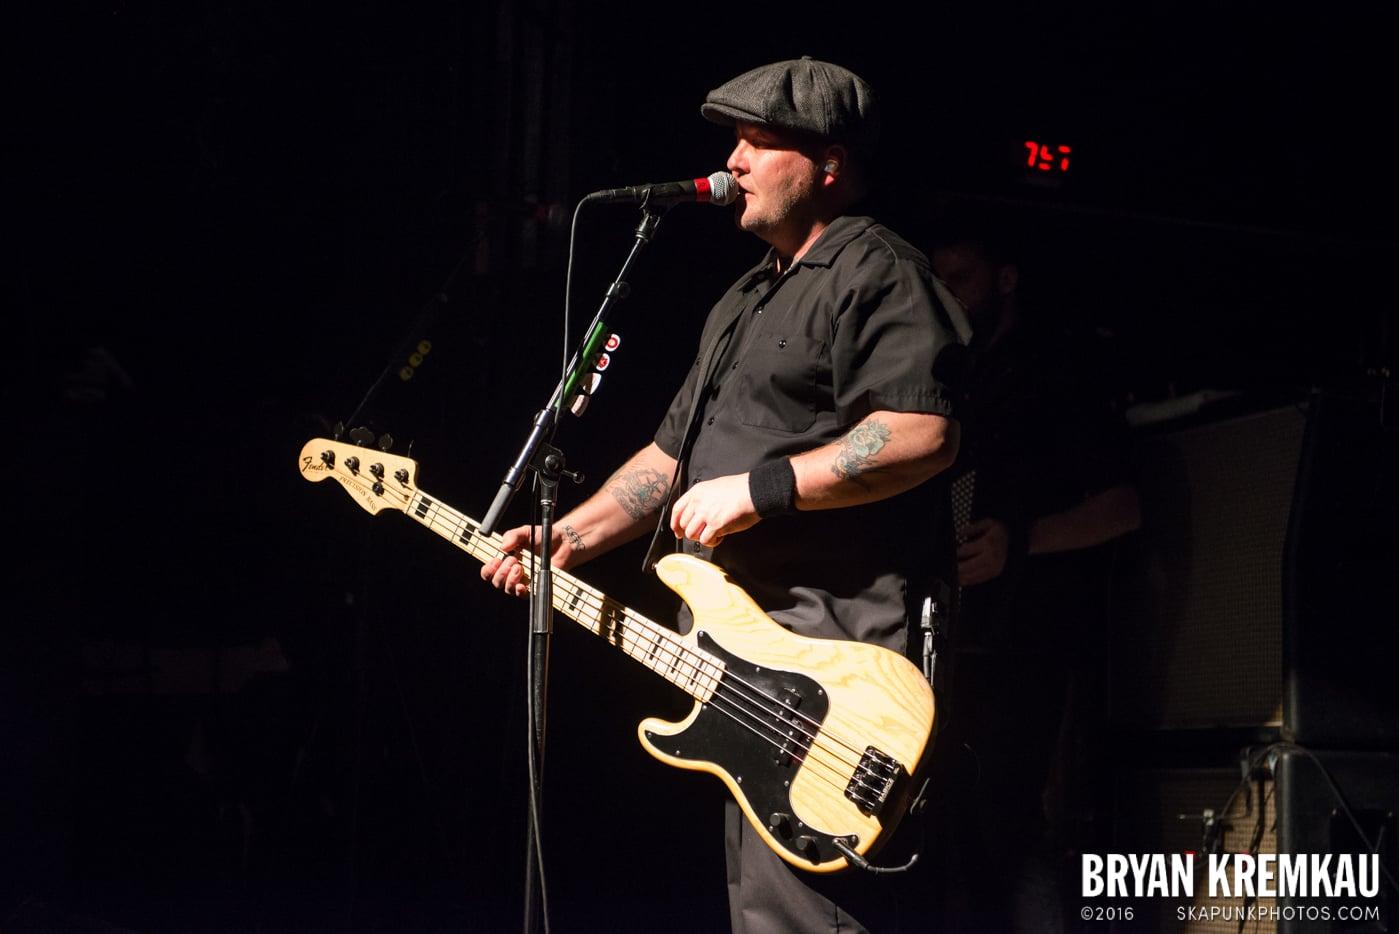 The Dropkick Murphys @ Irving Plaza, NYC - 3.9.15 (21)